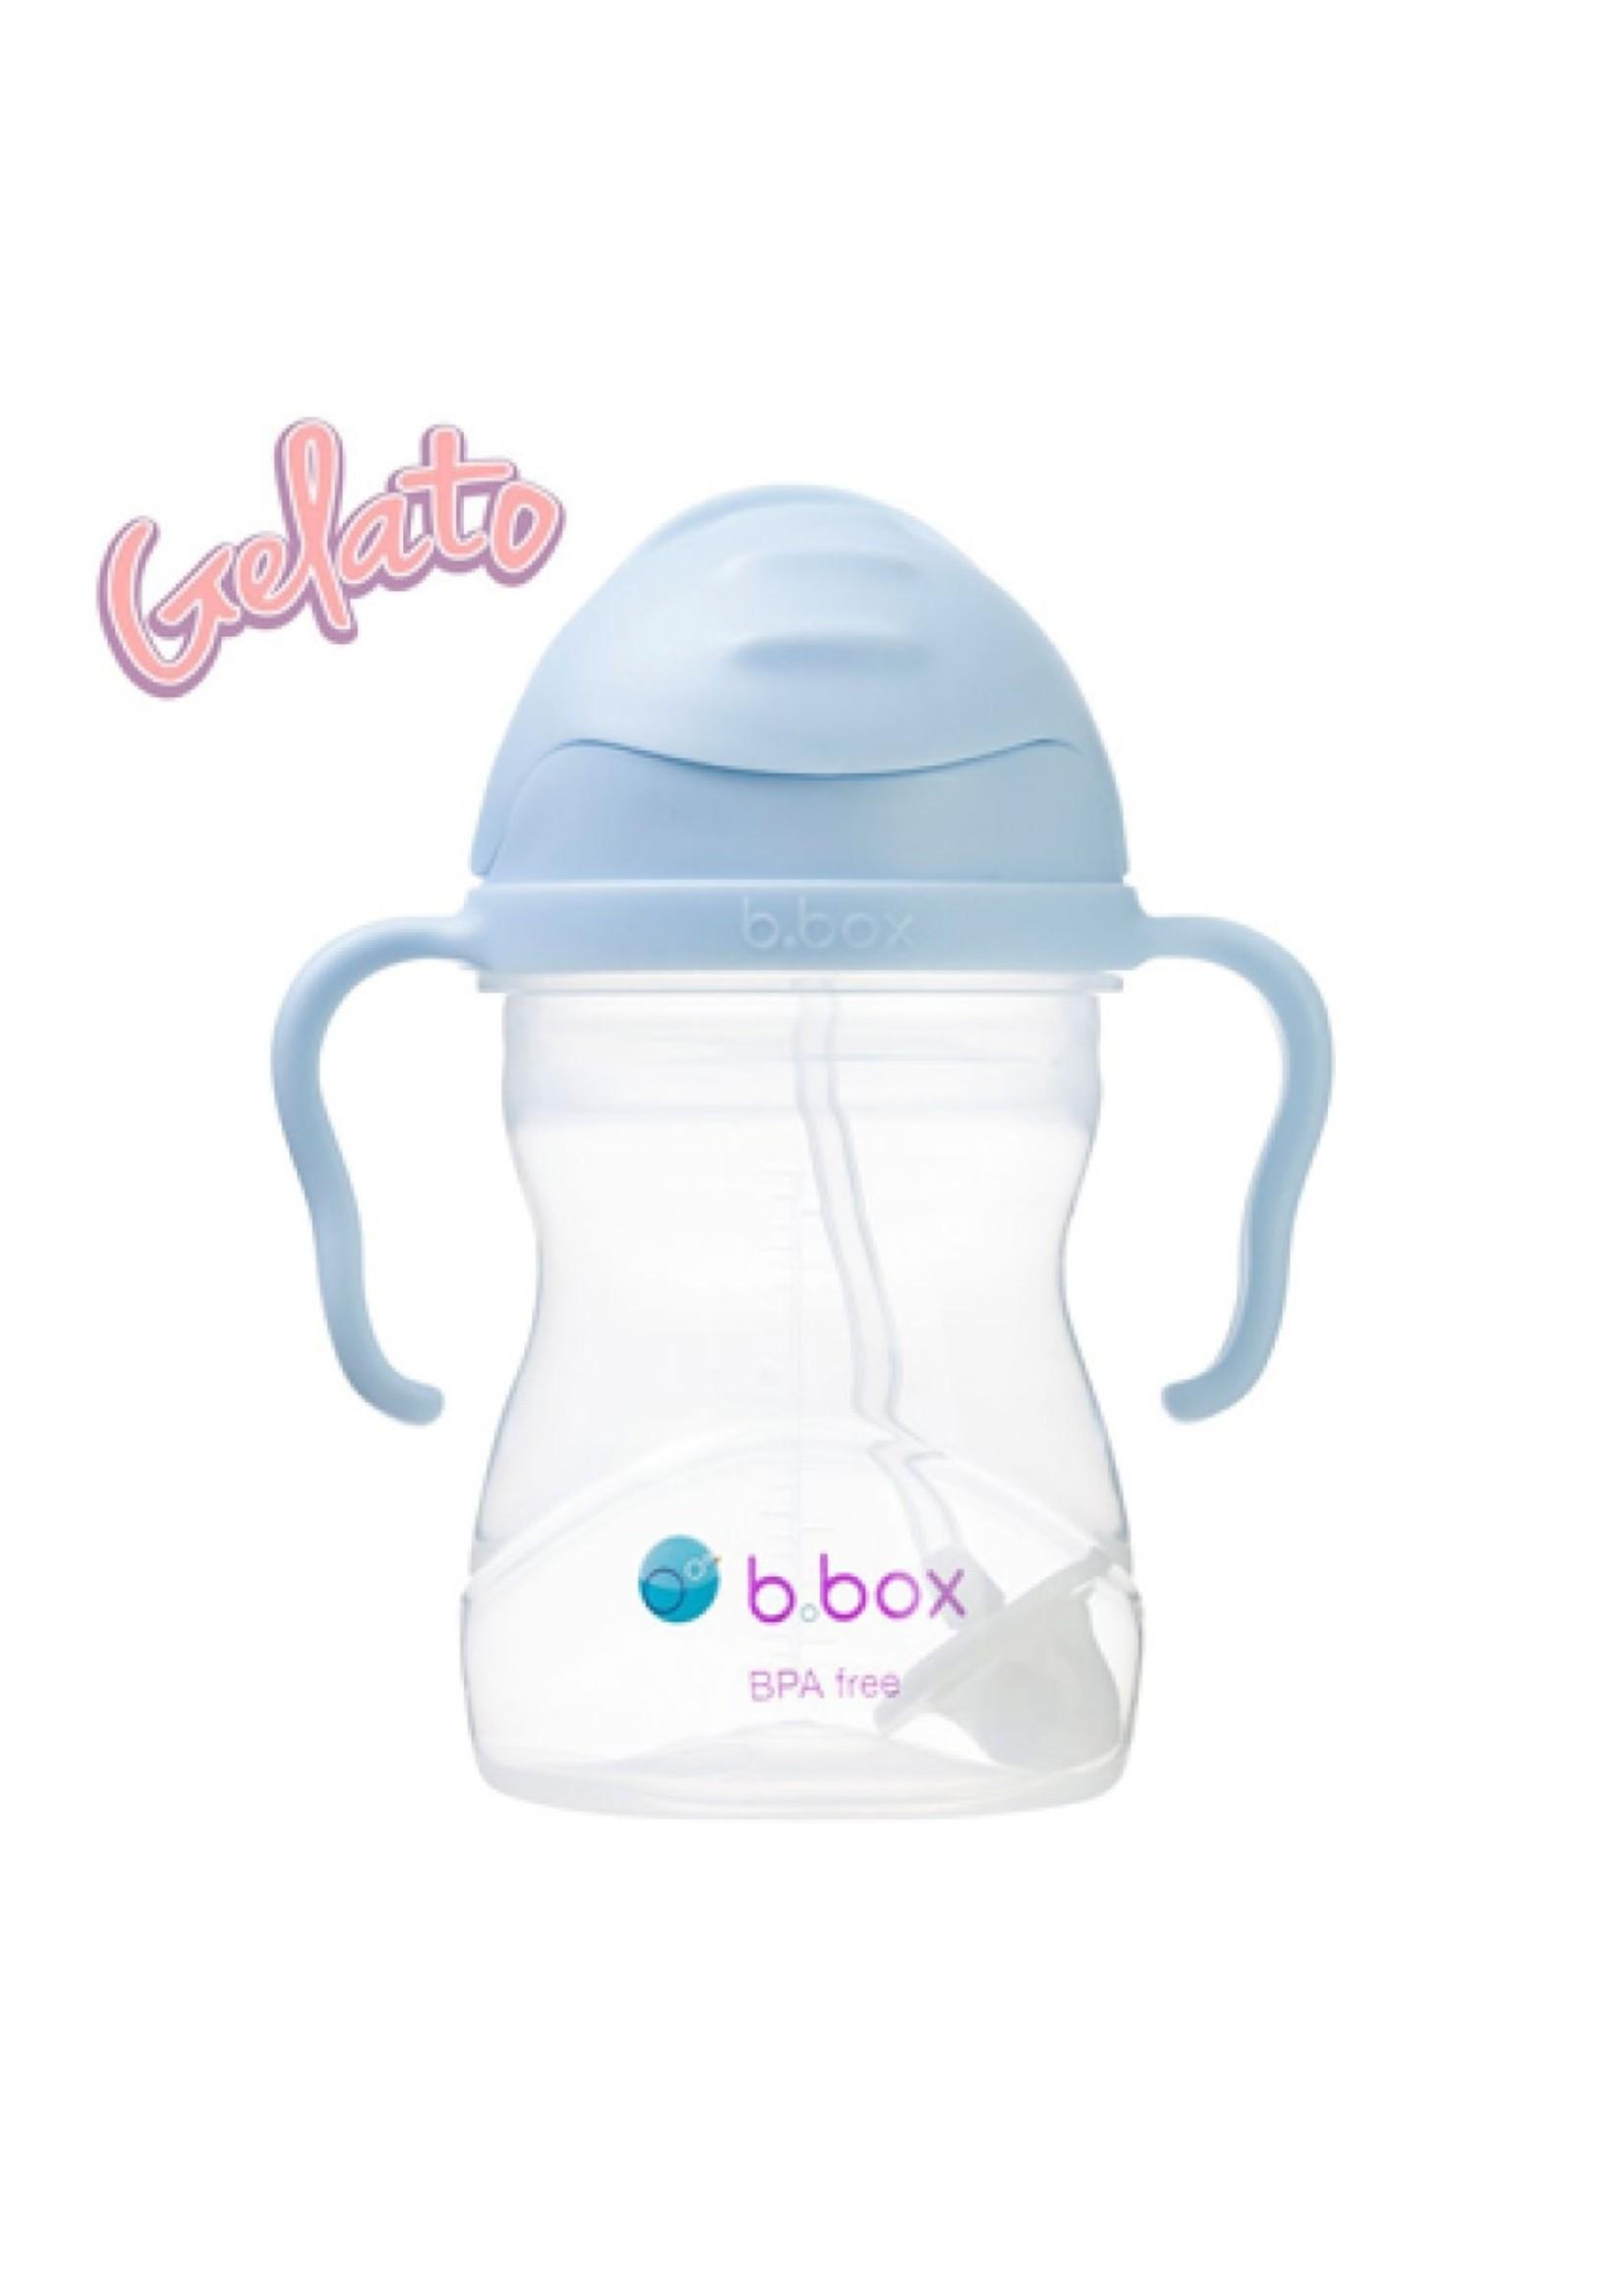 b.box b.box Sippy Cup (Bubblegum)